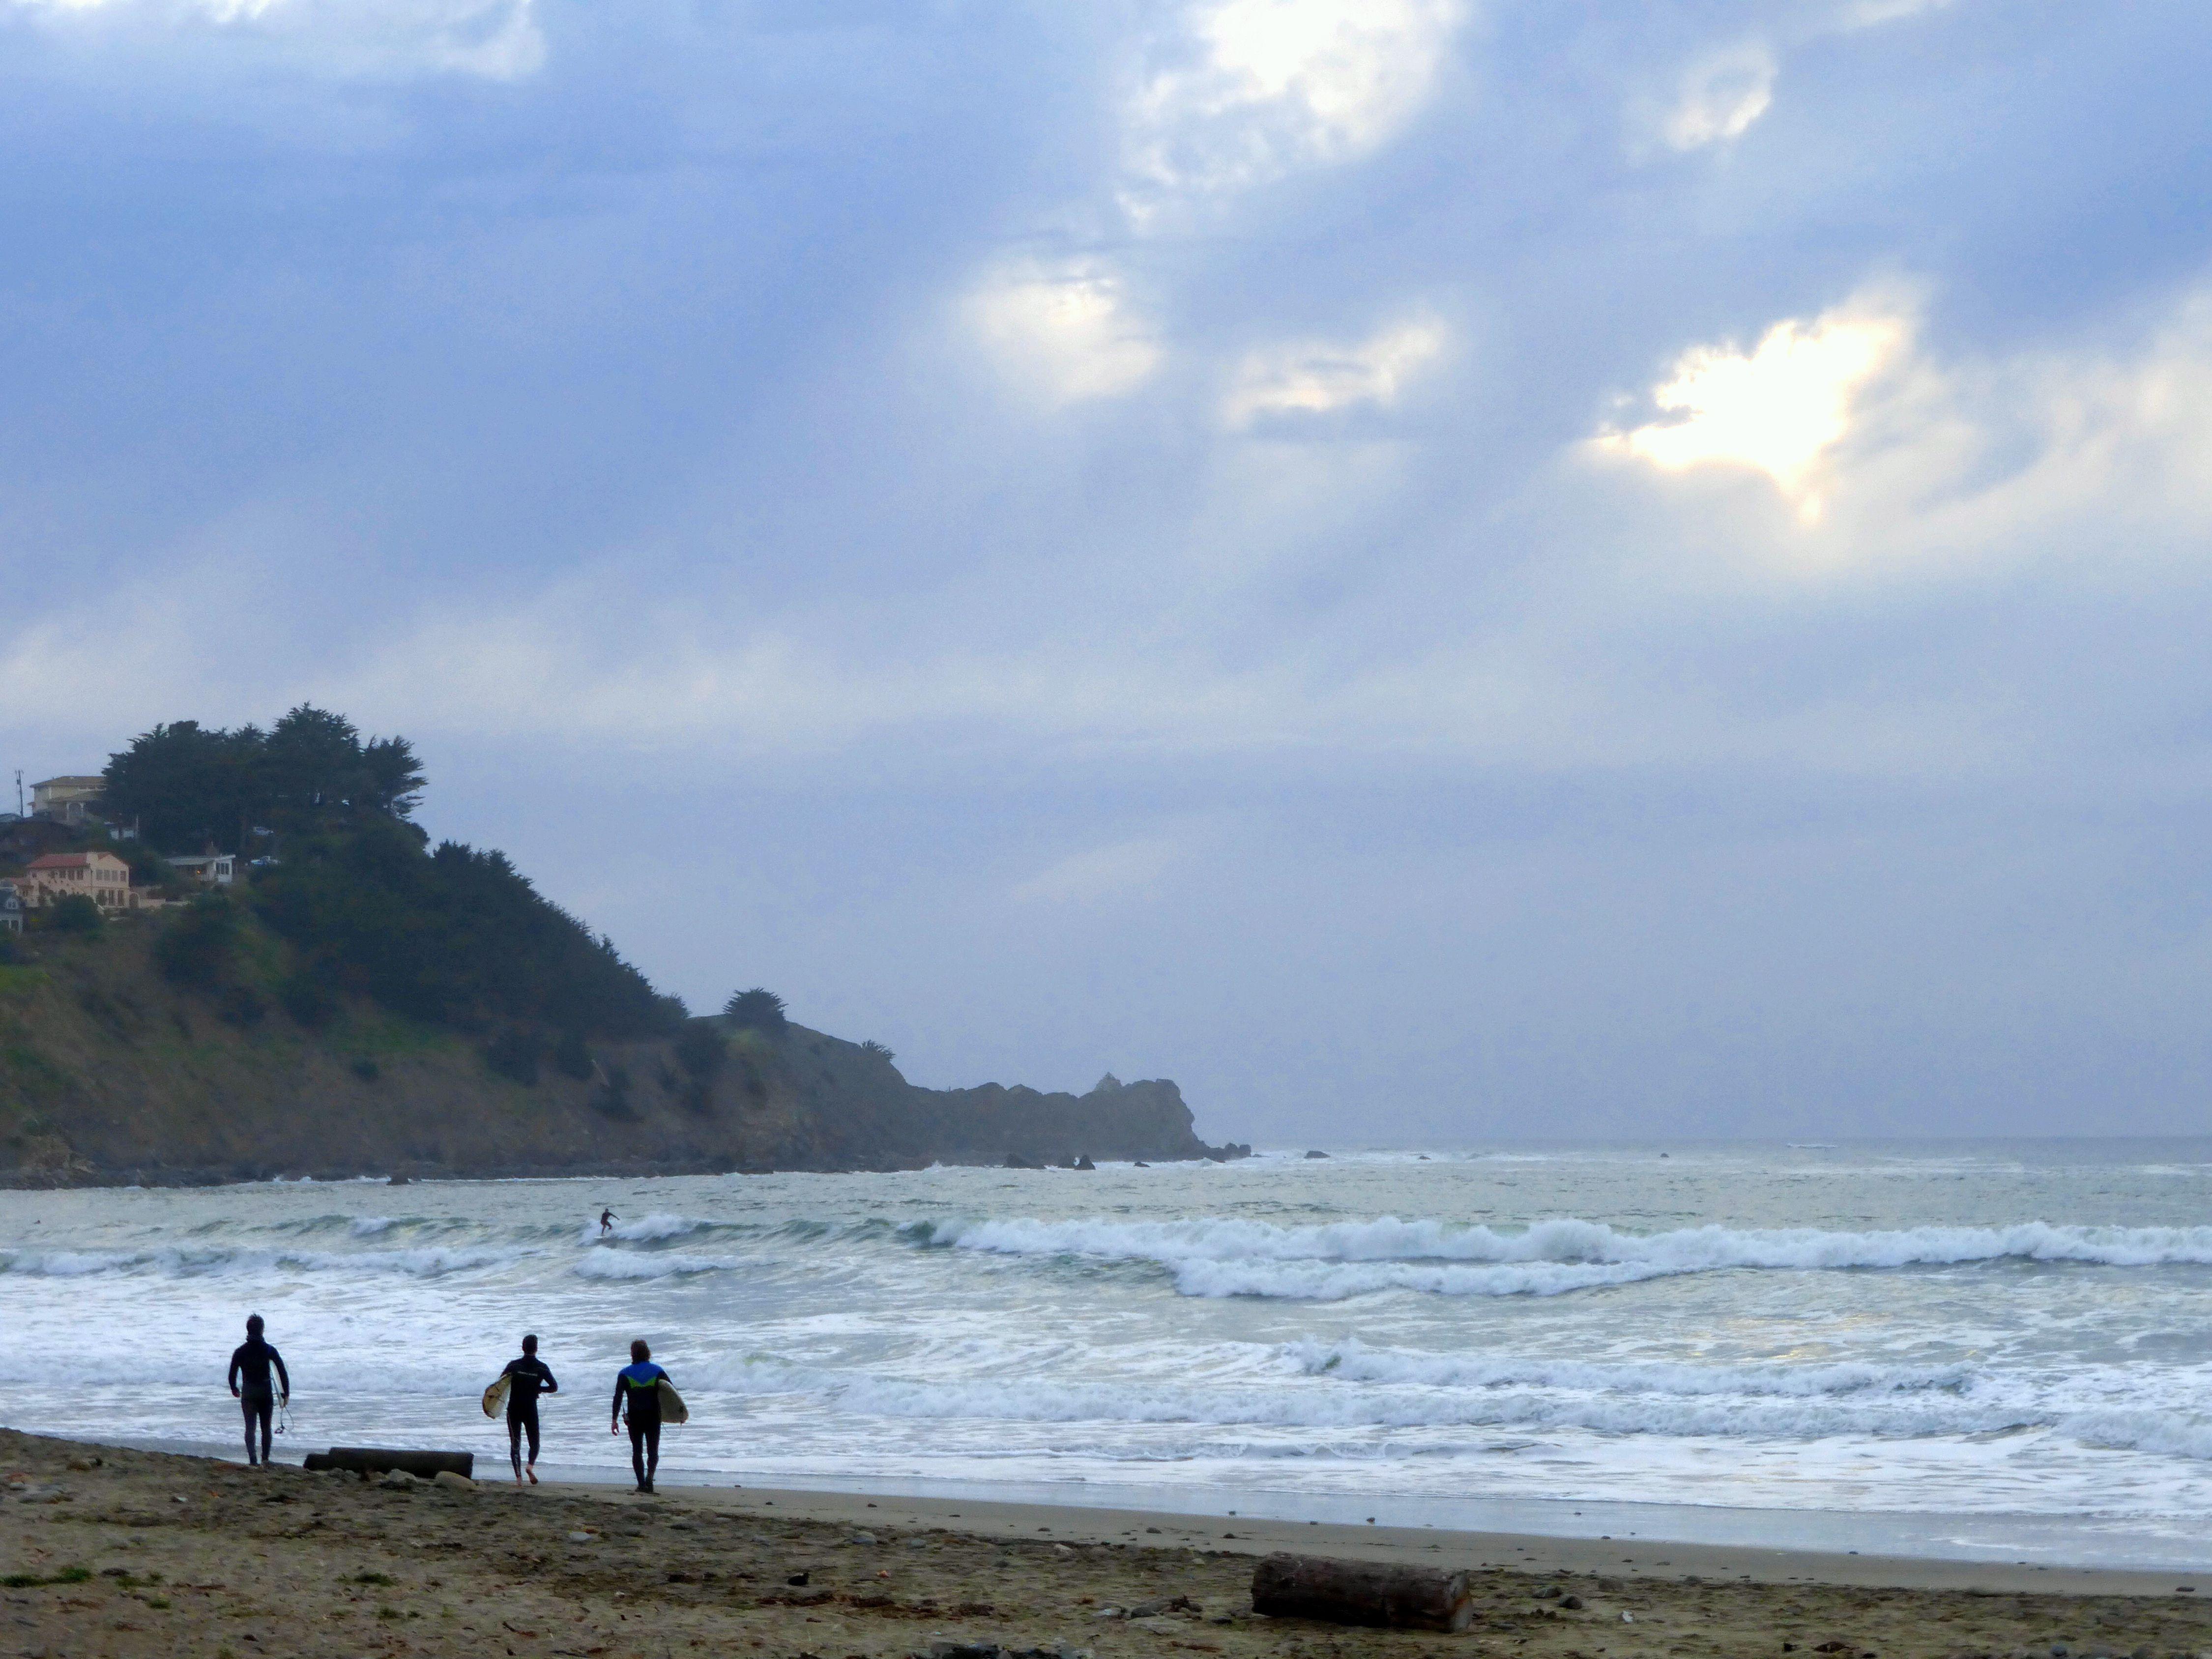 Linda Mar Surfing, Pacifica